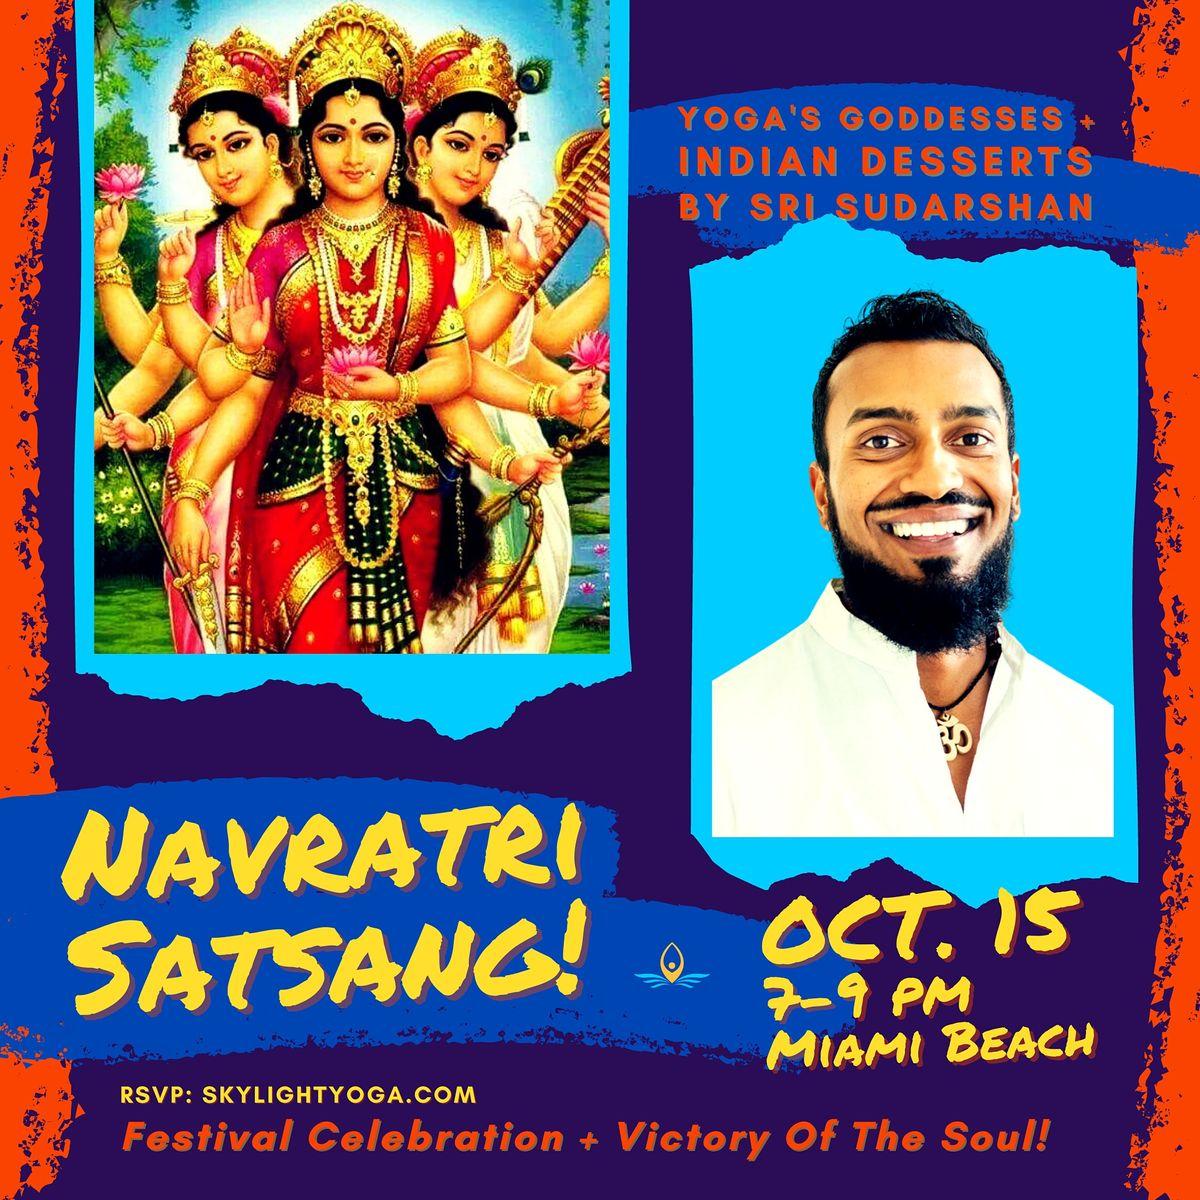 NAVRATRI FESTIVAL: Satsang & Indian Desserts